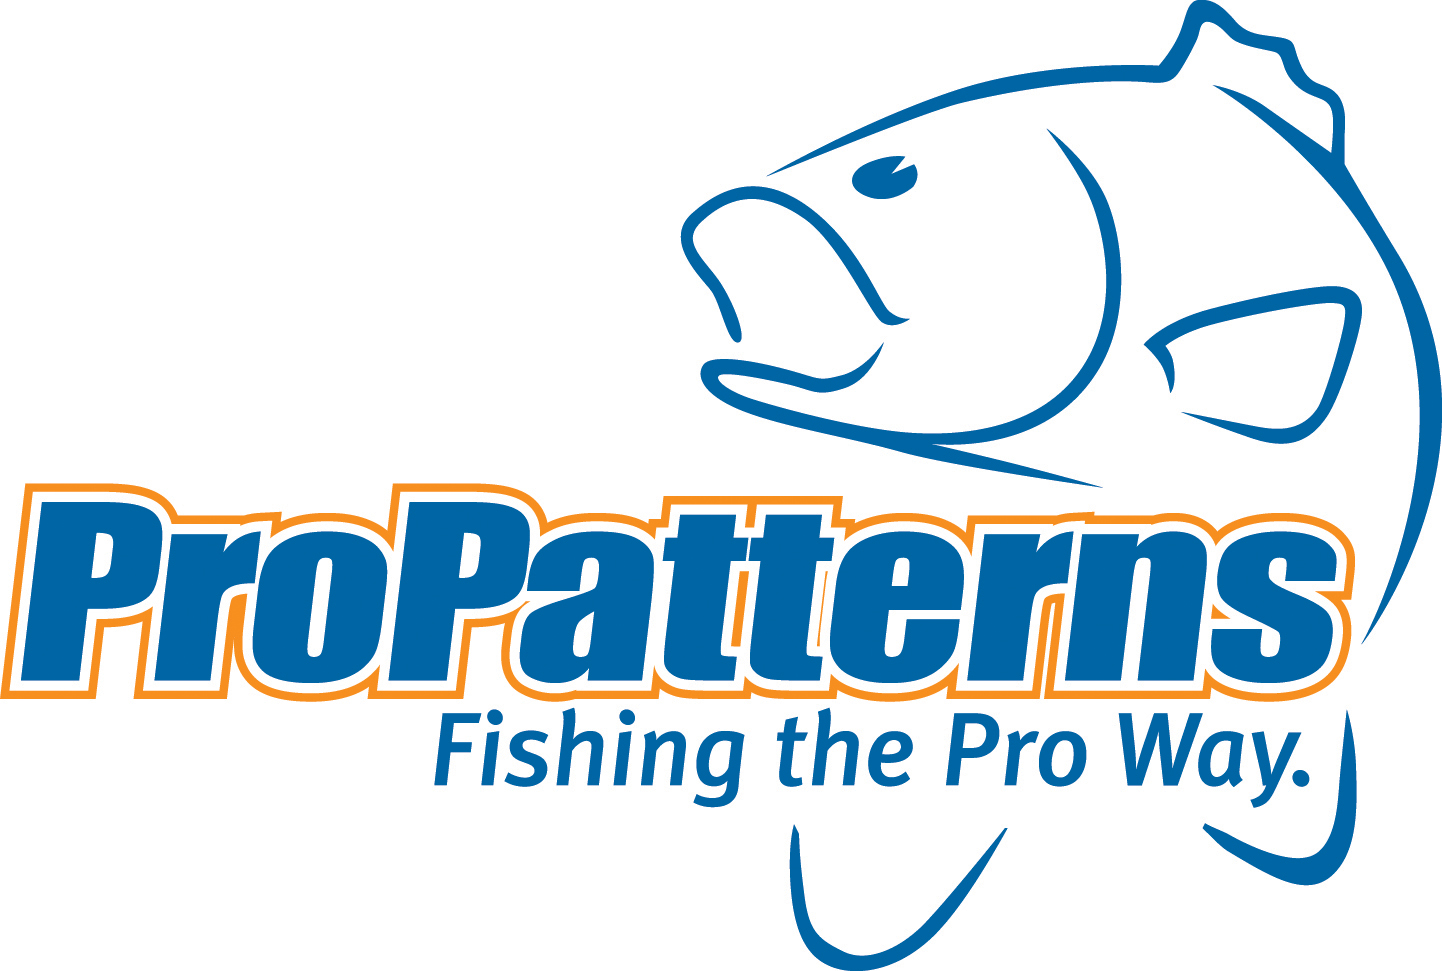 Fishing logo design - photo#12